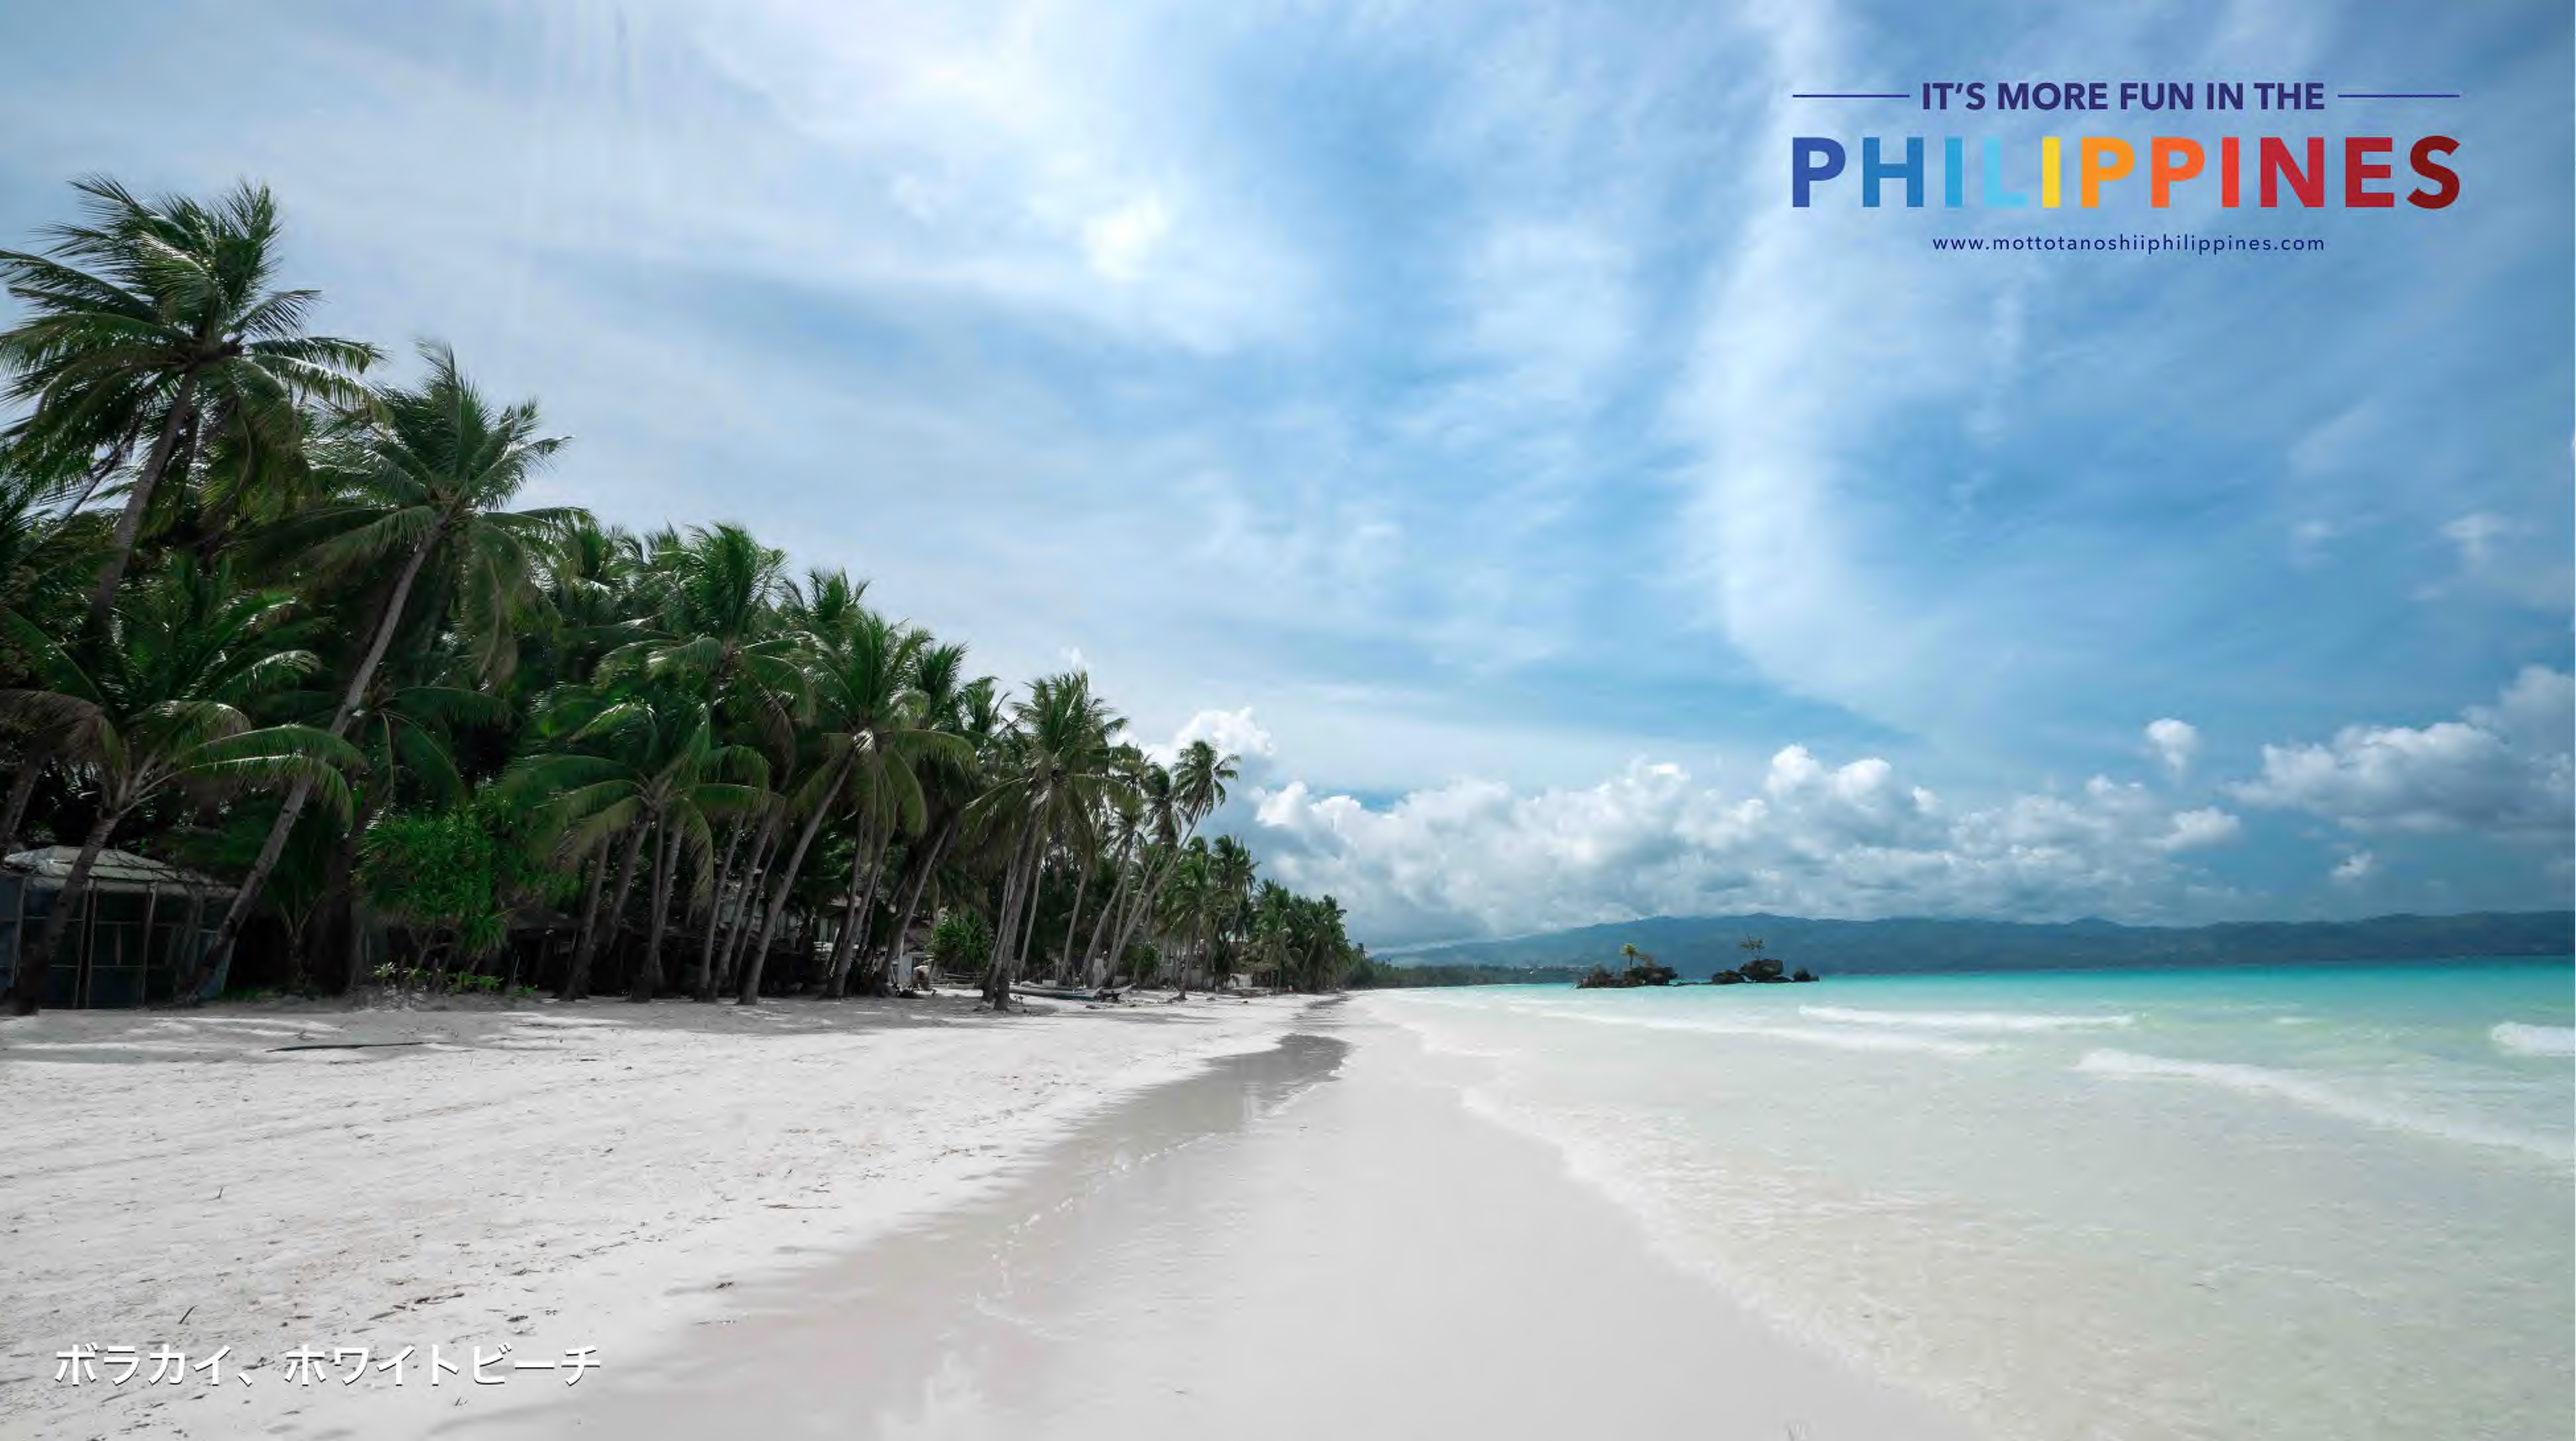 Boracay / Philippine Tourism